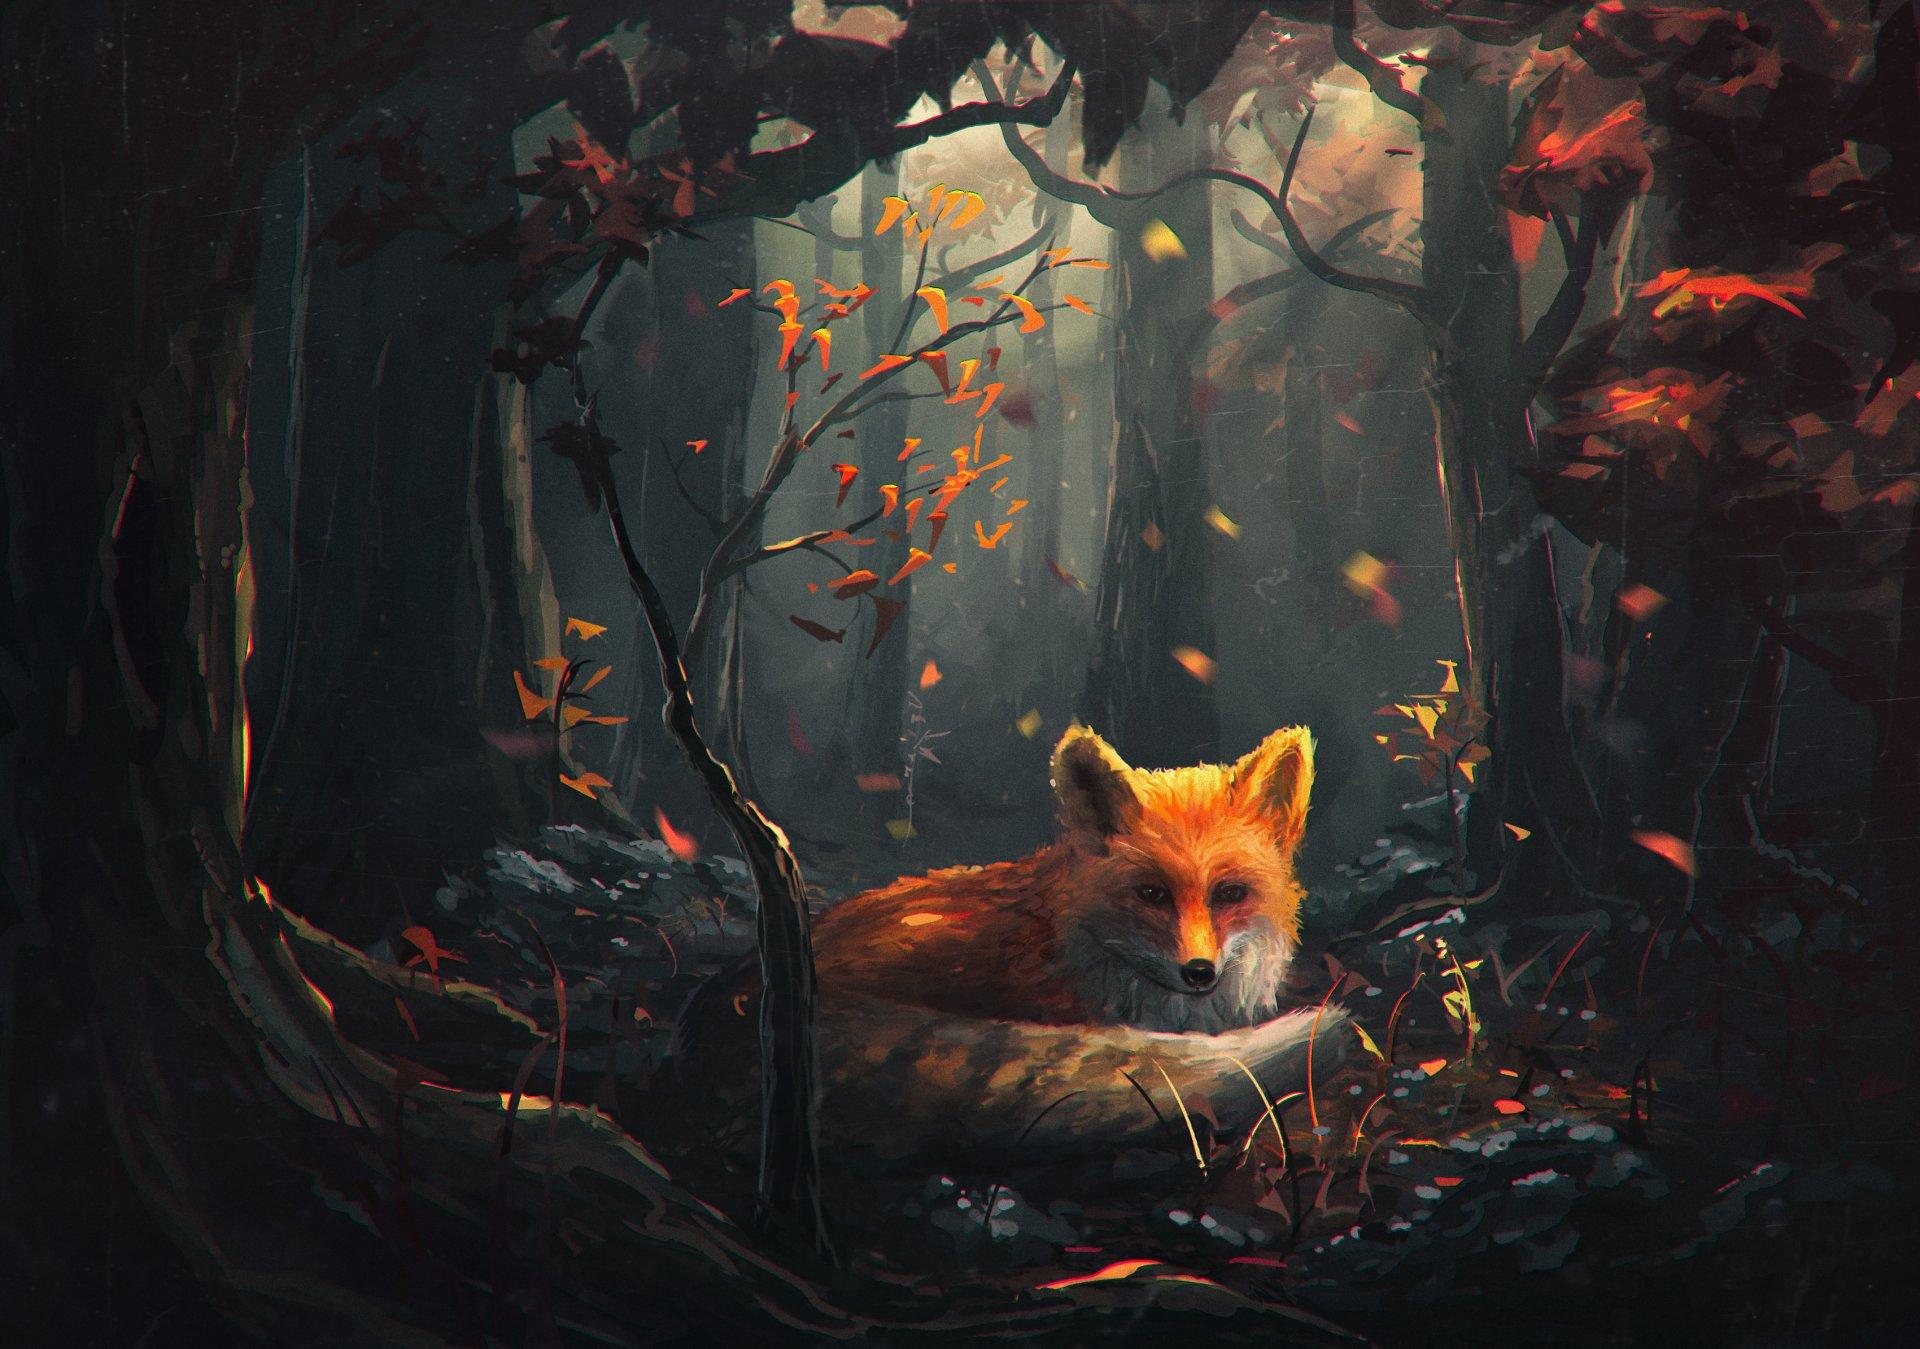 fox-art-view-forest-tree.jpg